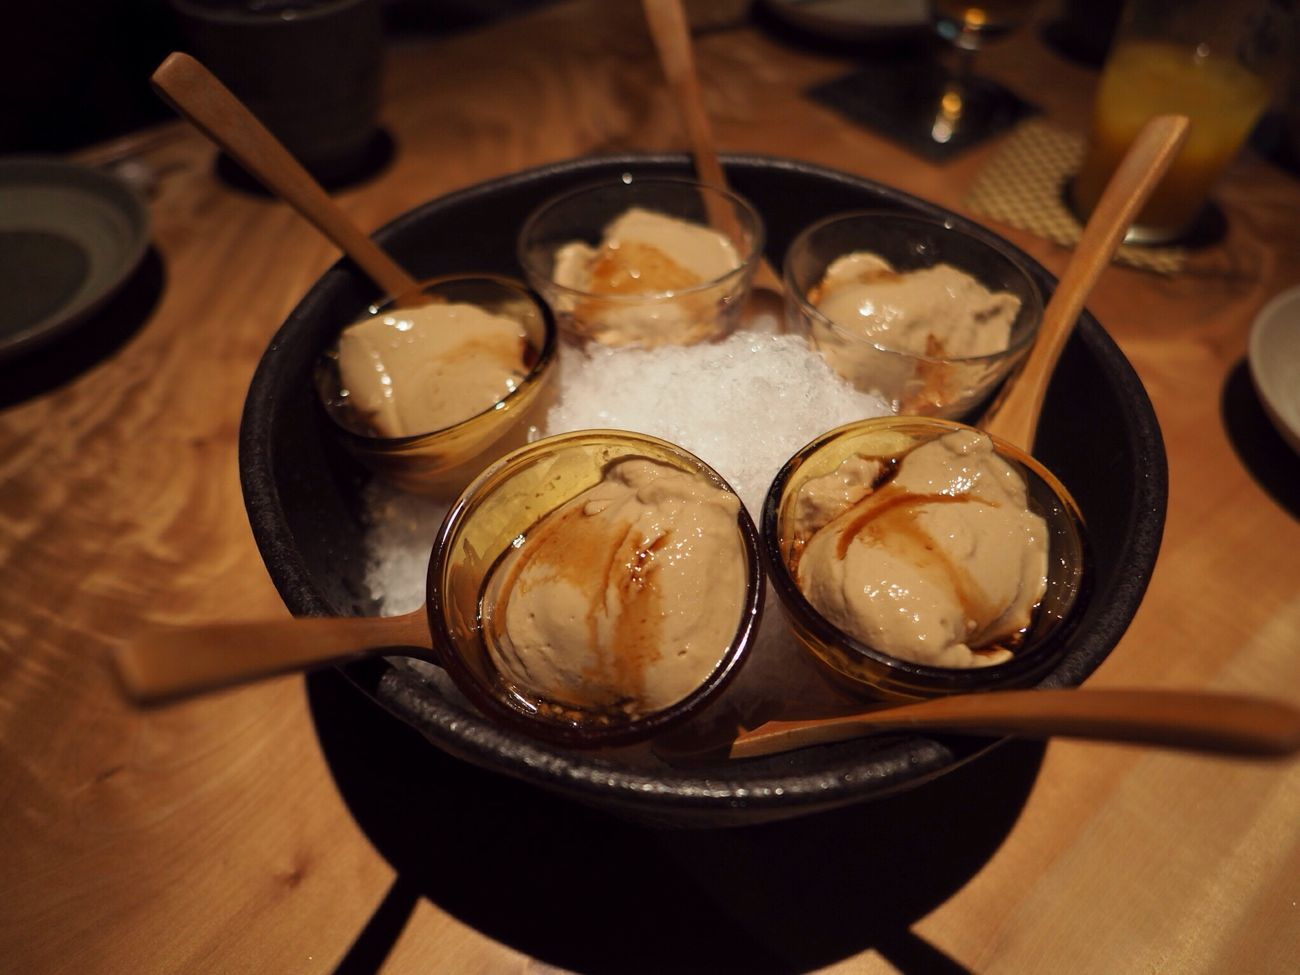 Kyoto Japan Nagaokakyo Enoki-ya Dinner Pudding Delicious Olympus PEN-F 京都 日本 長岡京 えのきや 食事会 プリン コーヒー? 美味 デザート